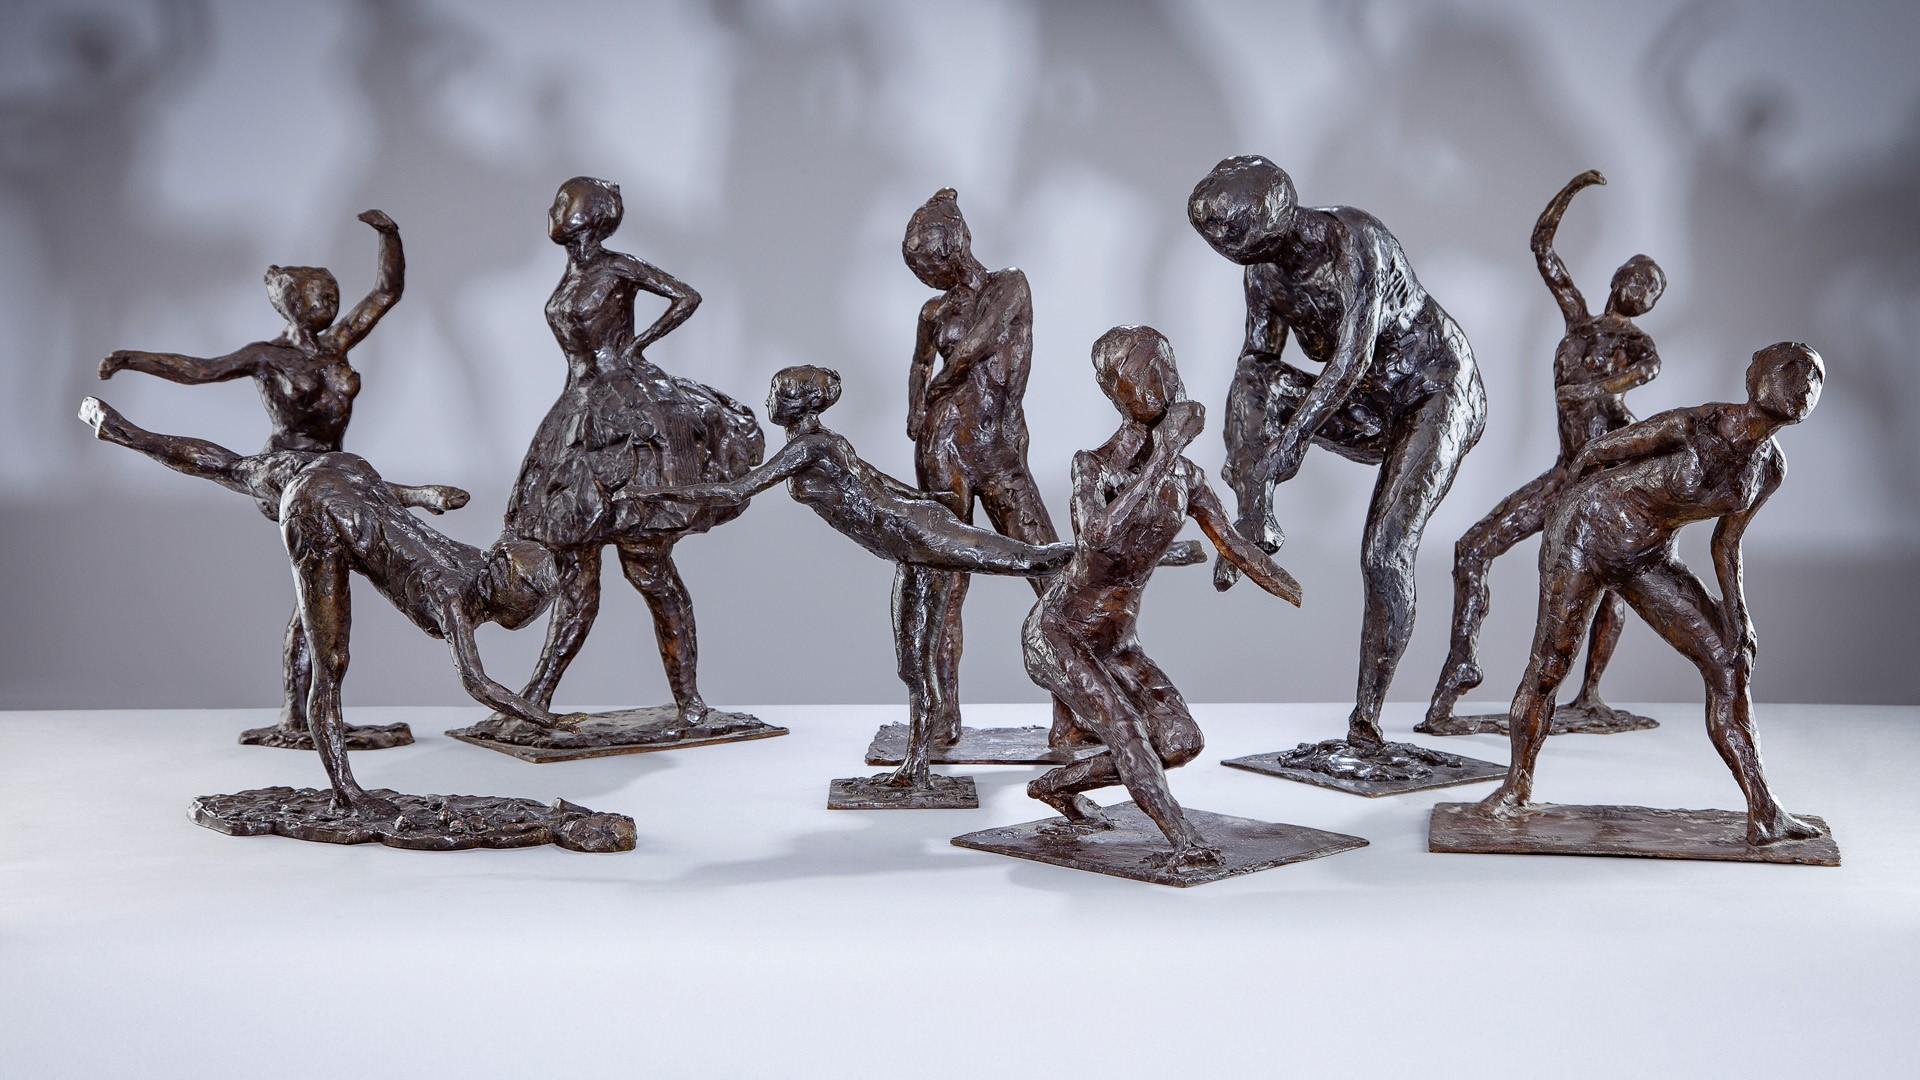 Arrangement photo of the sculptures of Edgar Degas dancers, photo: Marcin Koniak